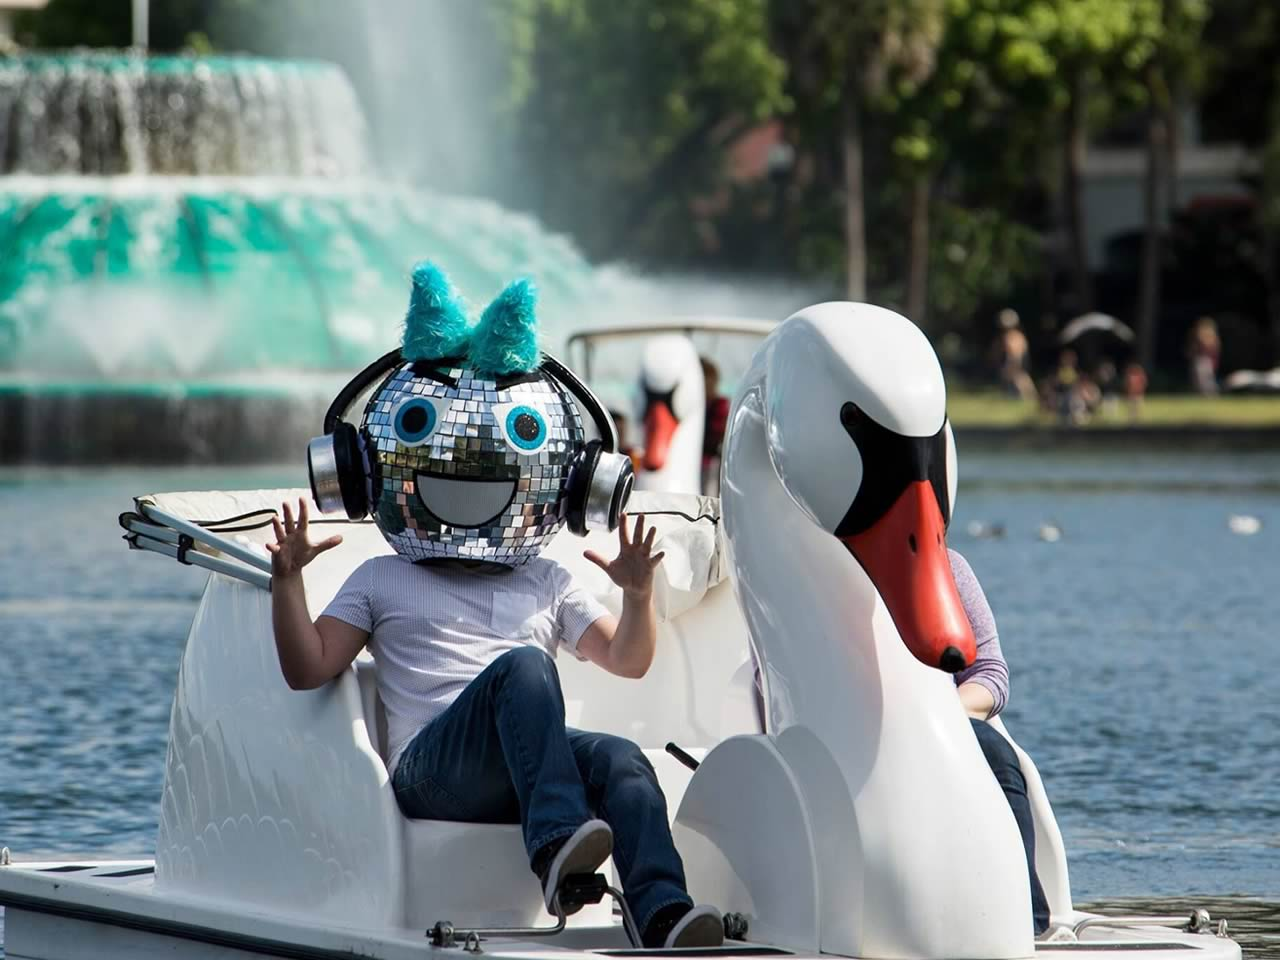 Whats Up Orlando - Book DJ Rage